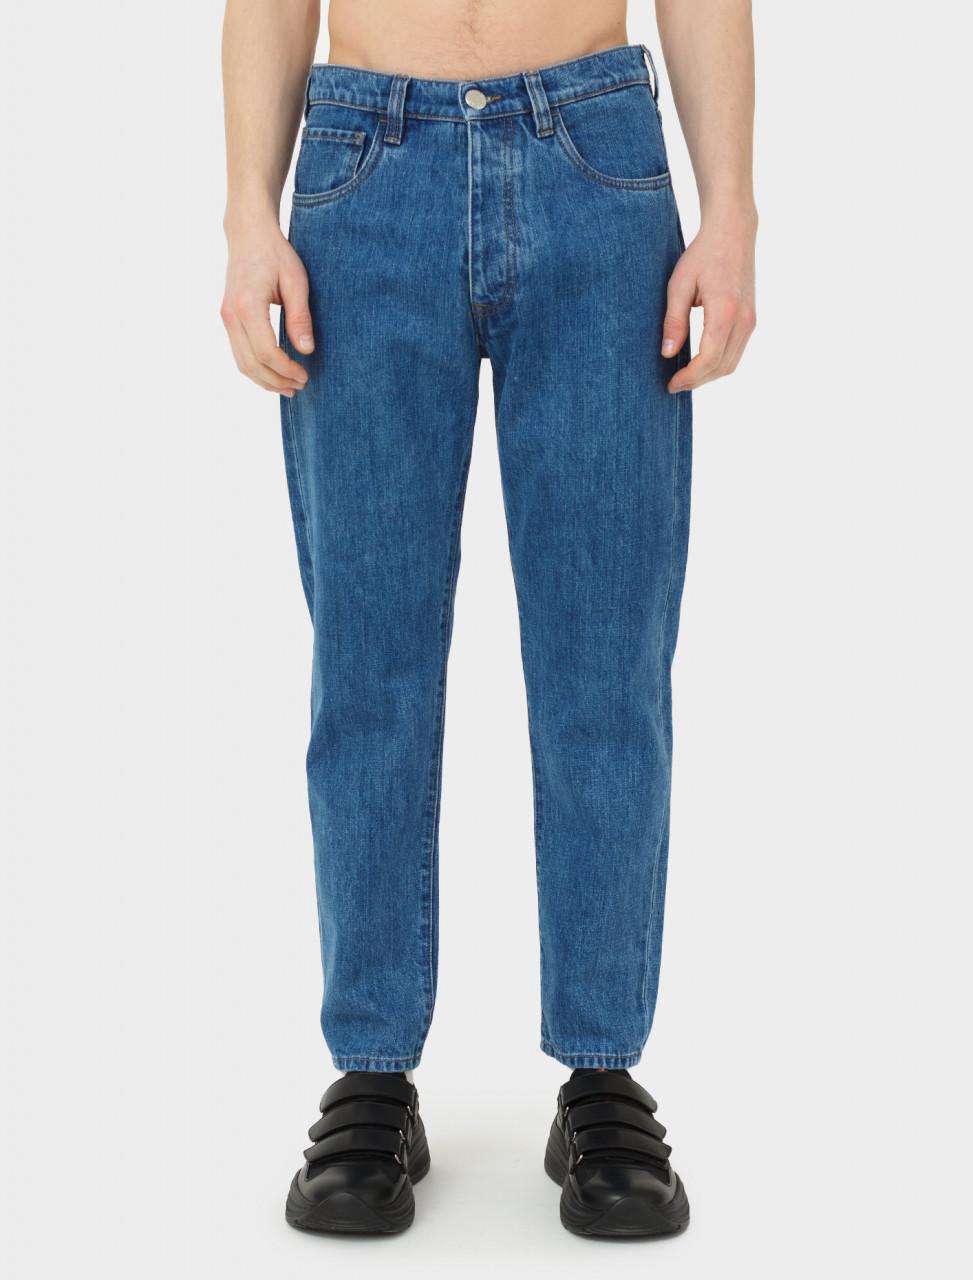 Prada Vintage Denim Jeans